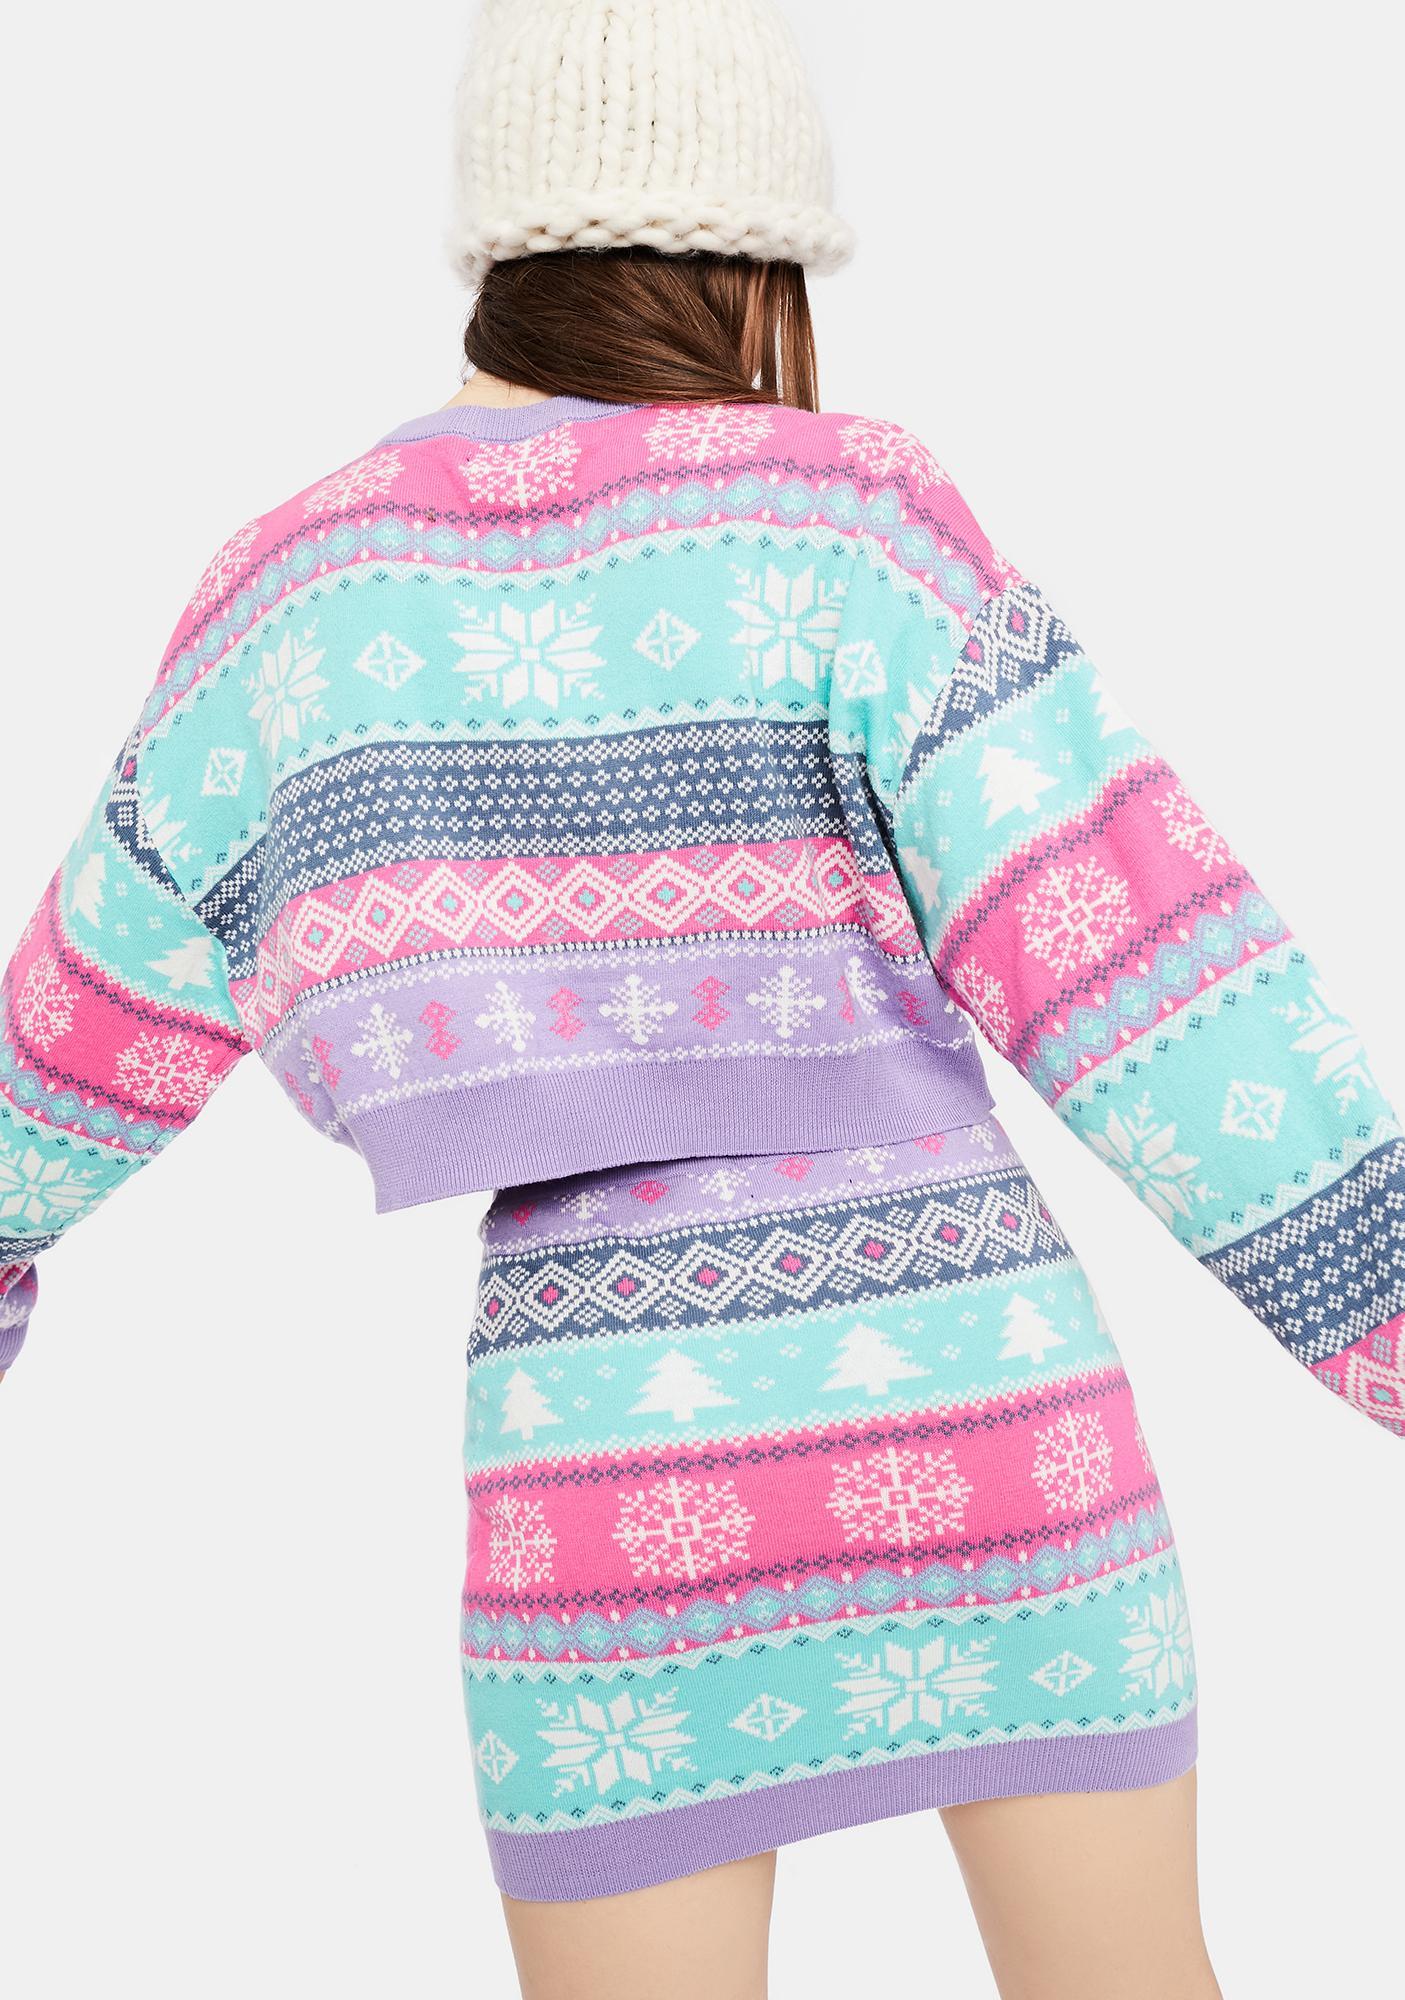 dELiA*s by Dolls Kill Visions Of Sugarplums Fairisle Sweater